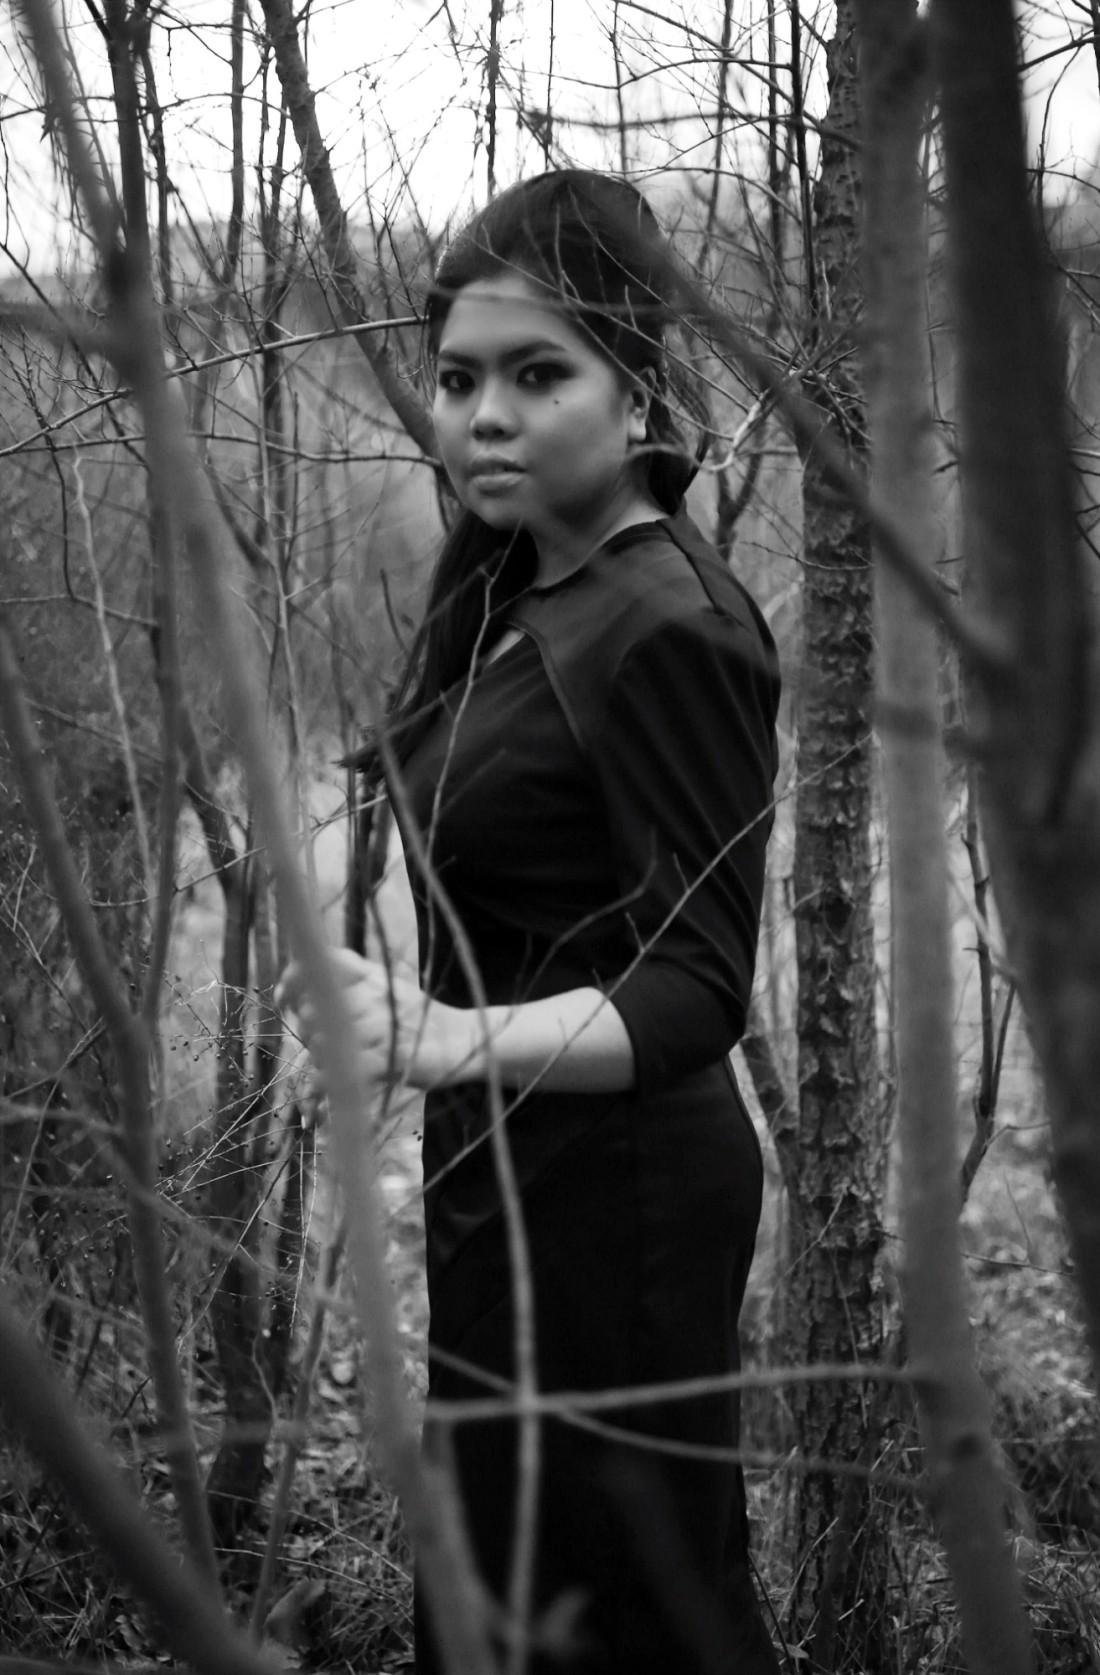 little black dress by rosaly escueta x federico boschetto